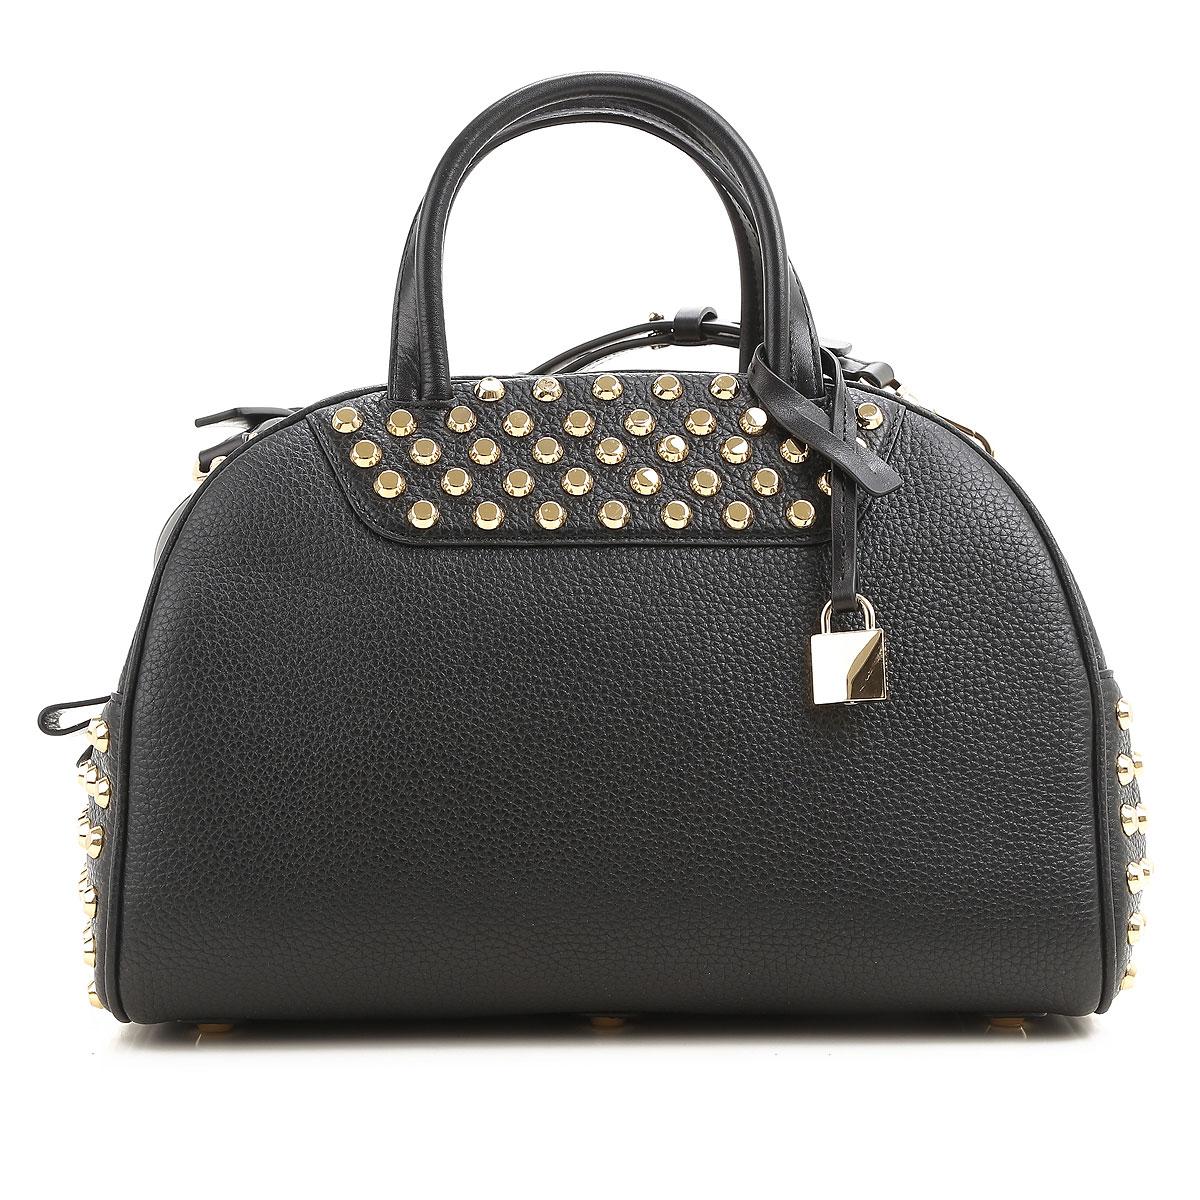 Michael Kors Top Handle Handbag On Sale, Black, Leather, 2017